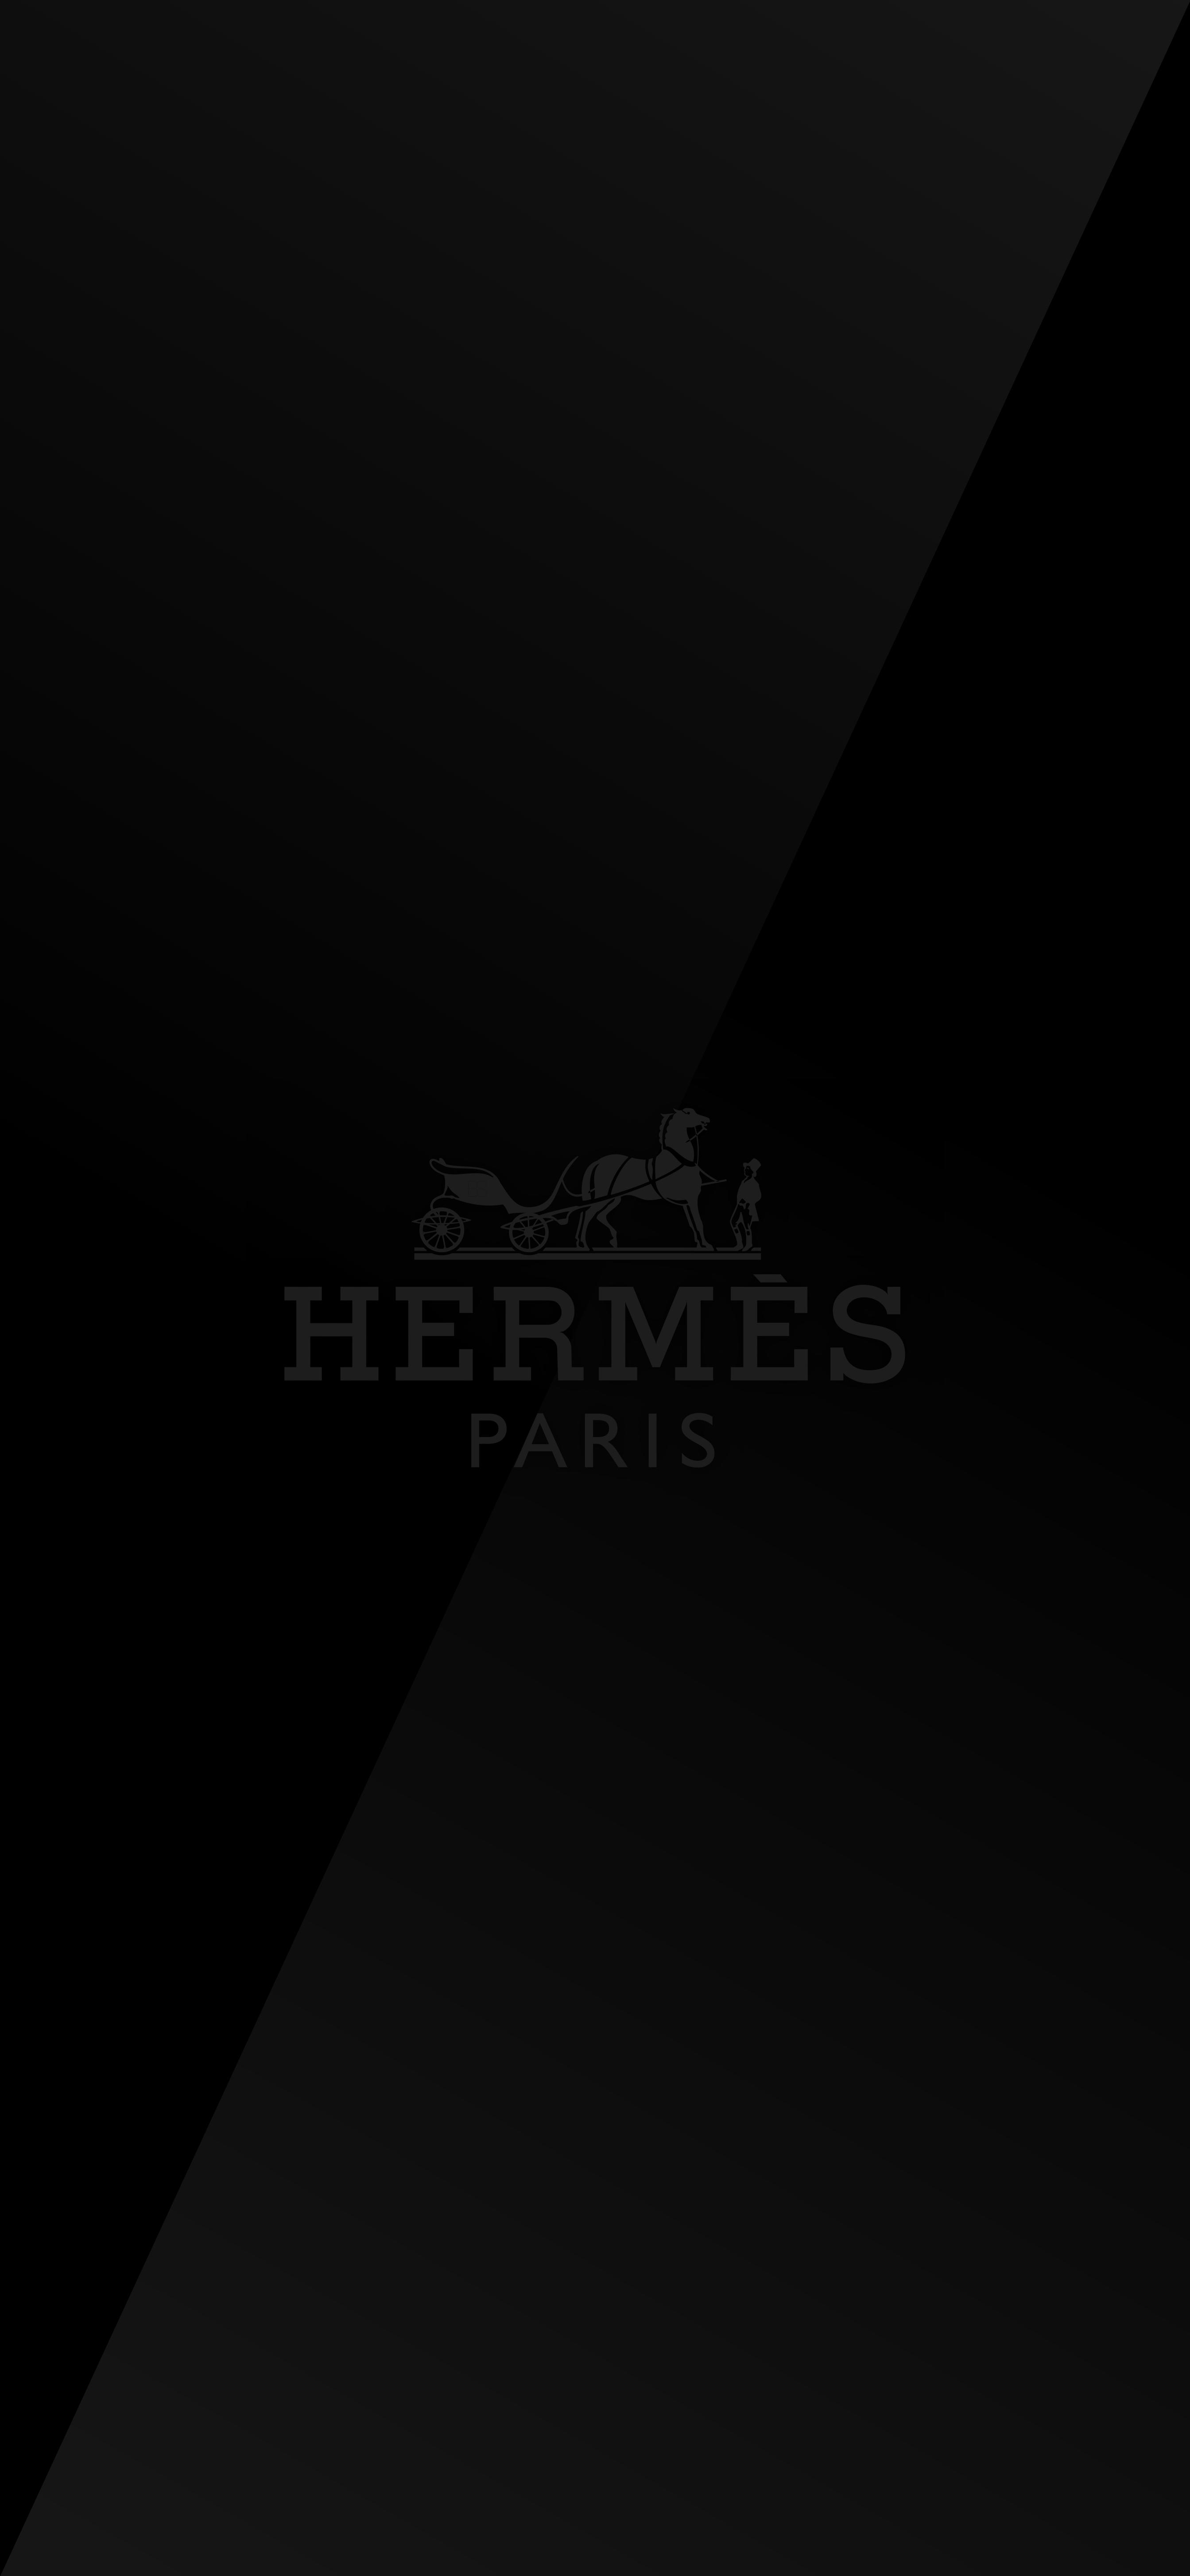 HERMÈS iPhone X Series wallpaper iOS 13 (Dark Mode